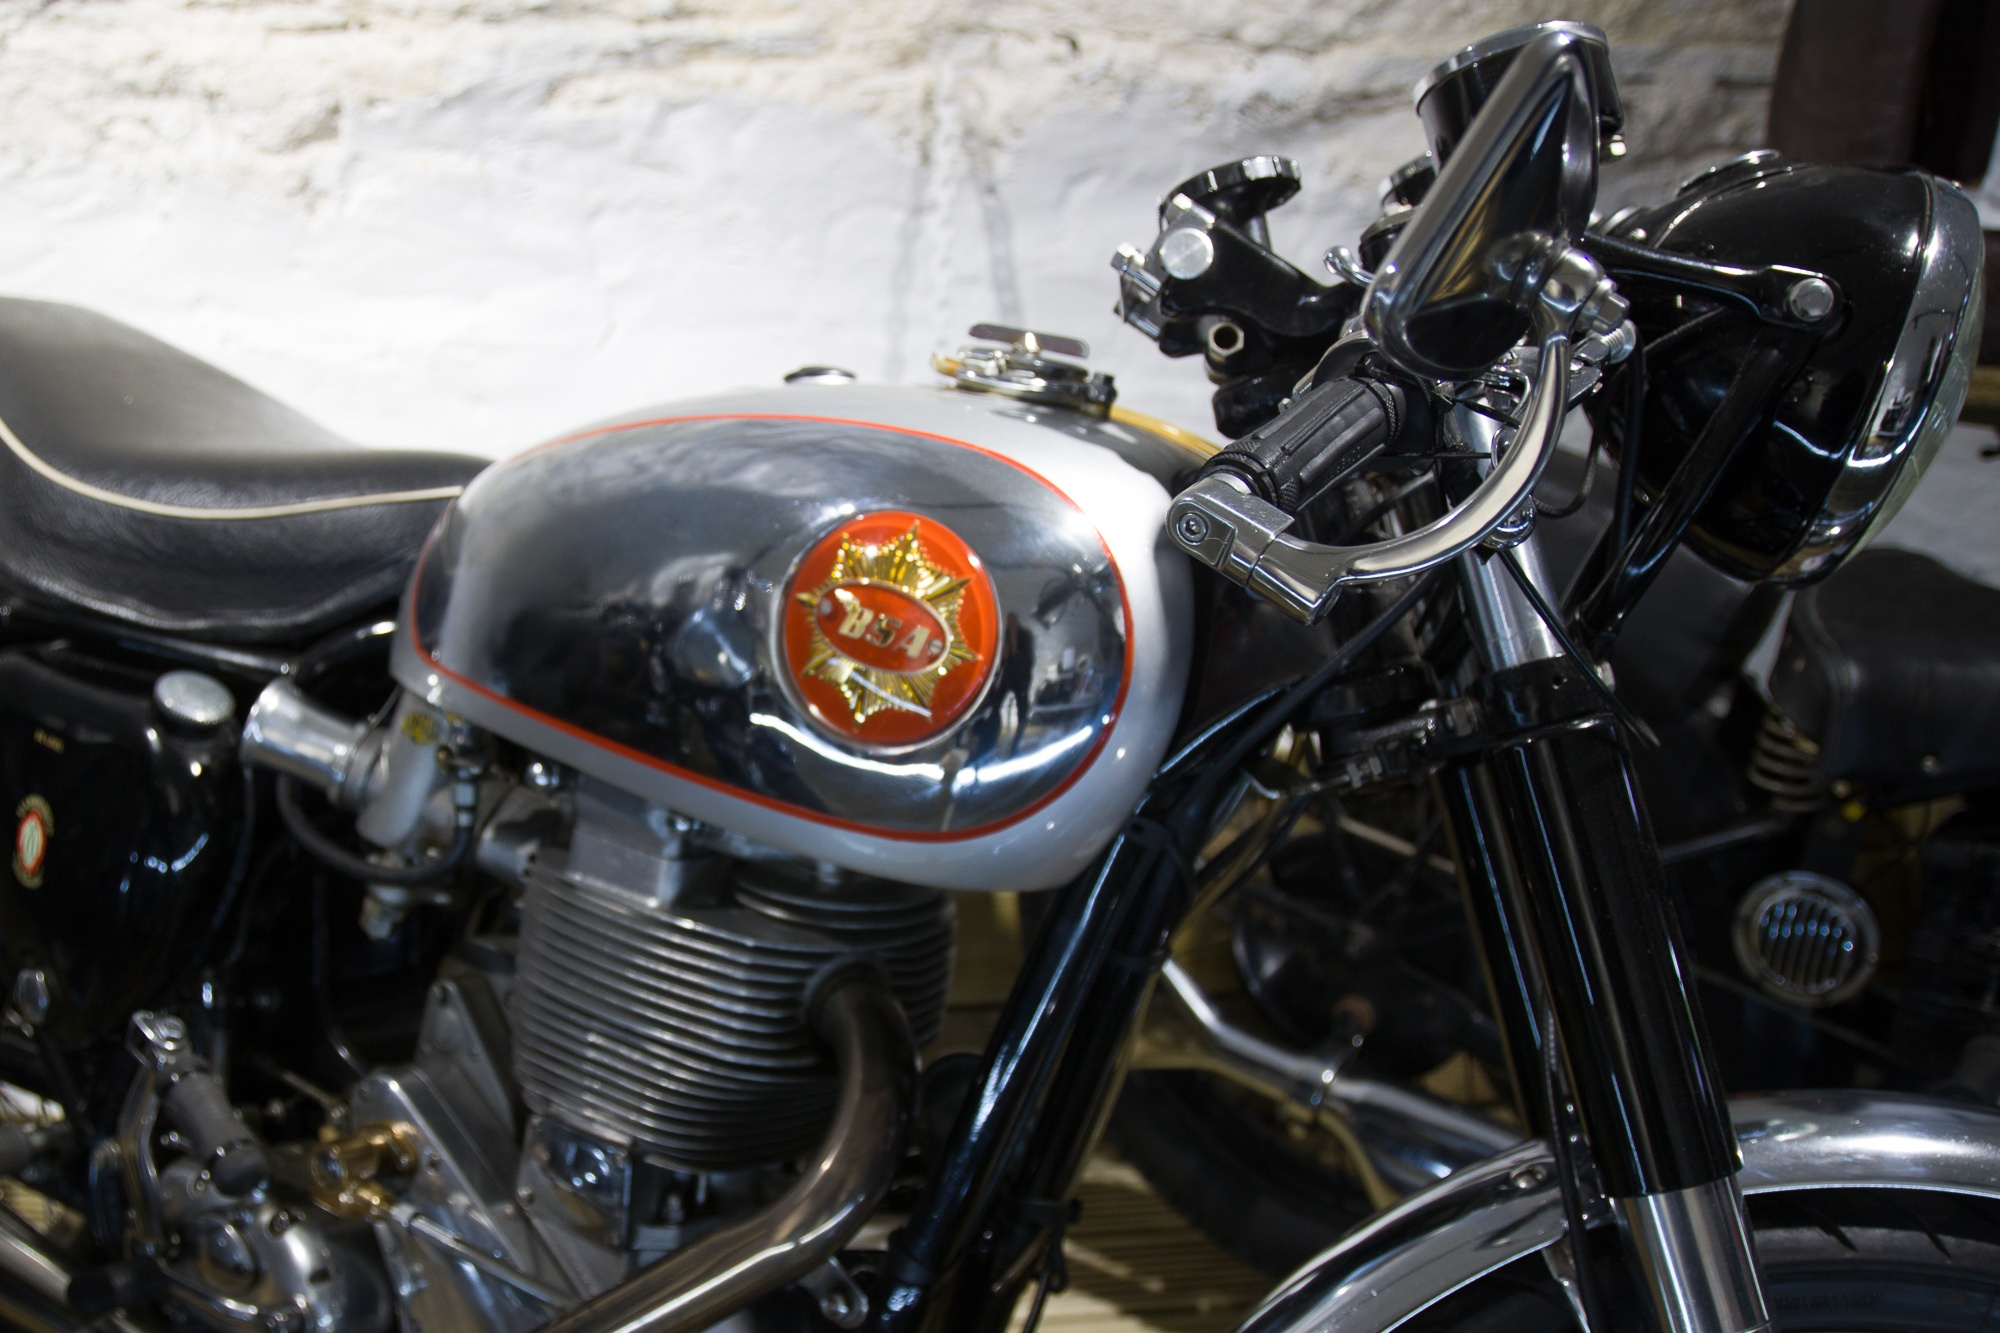 BSA Gold Star DBD34 1961